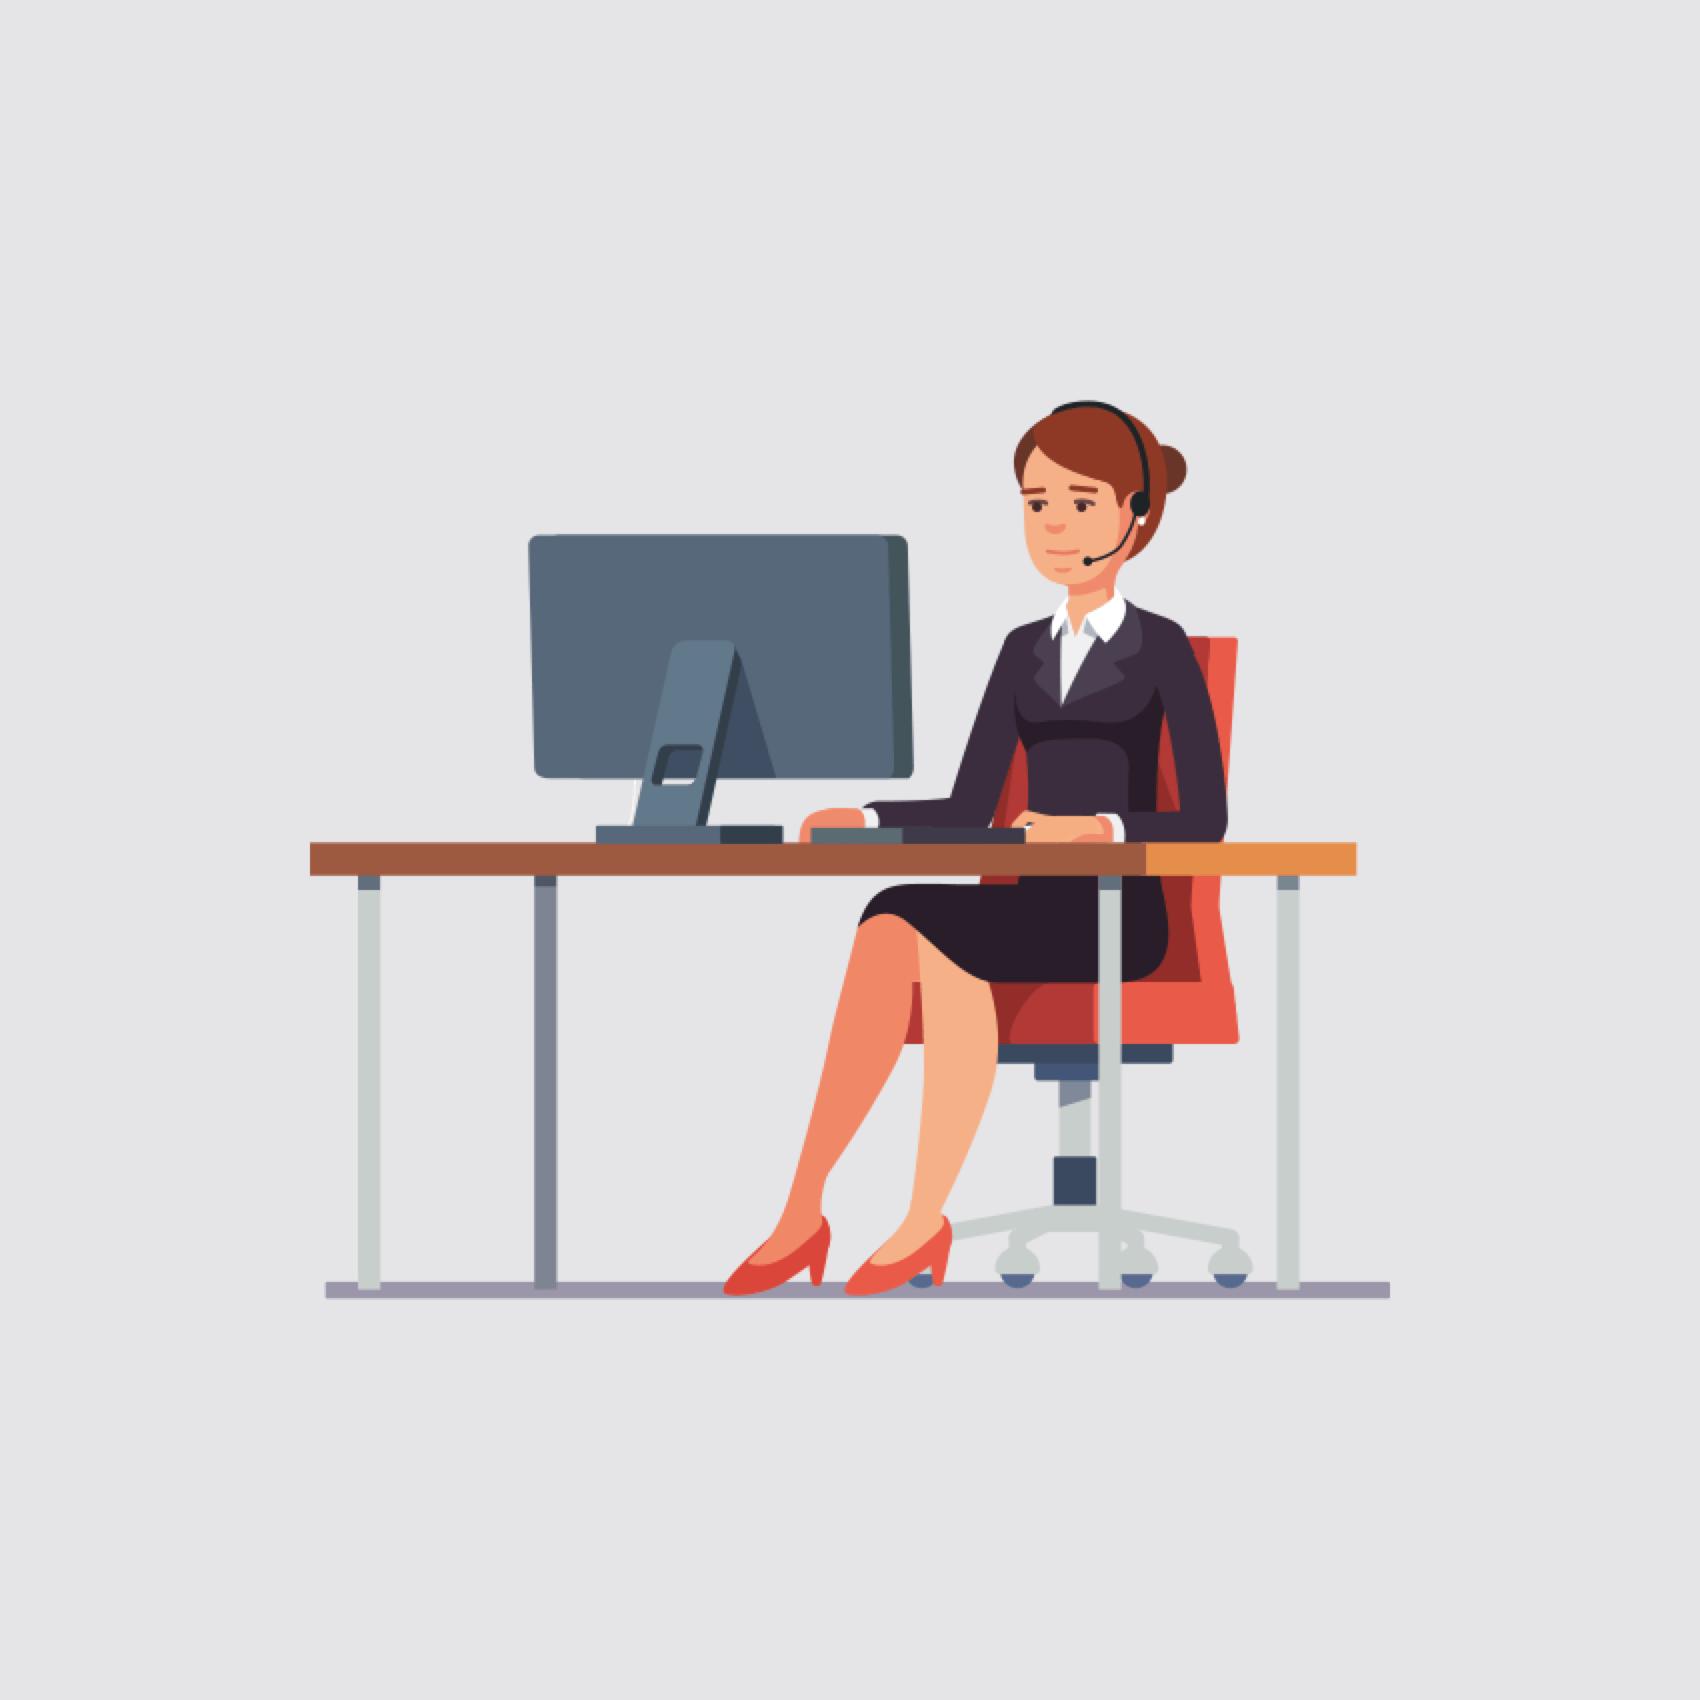 Welbeing customer service illustration